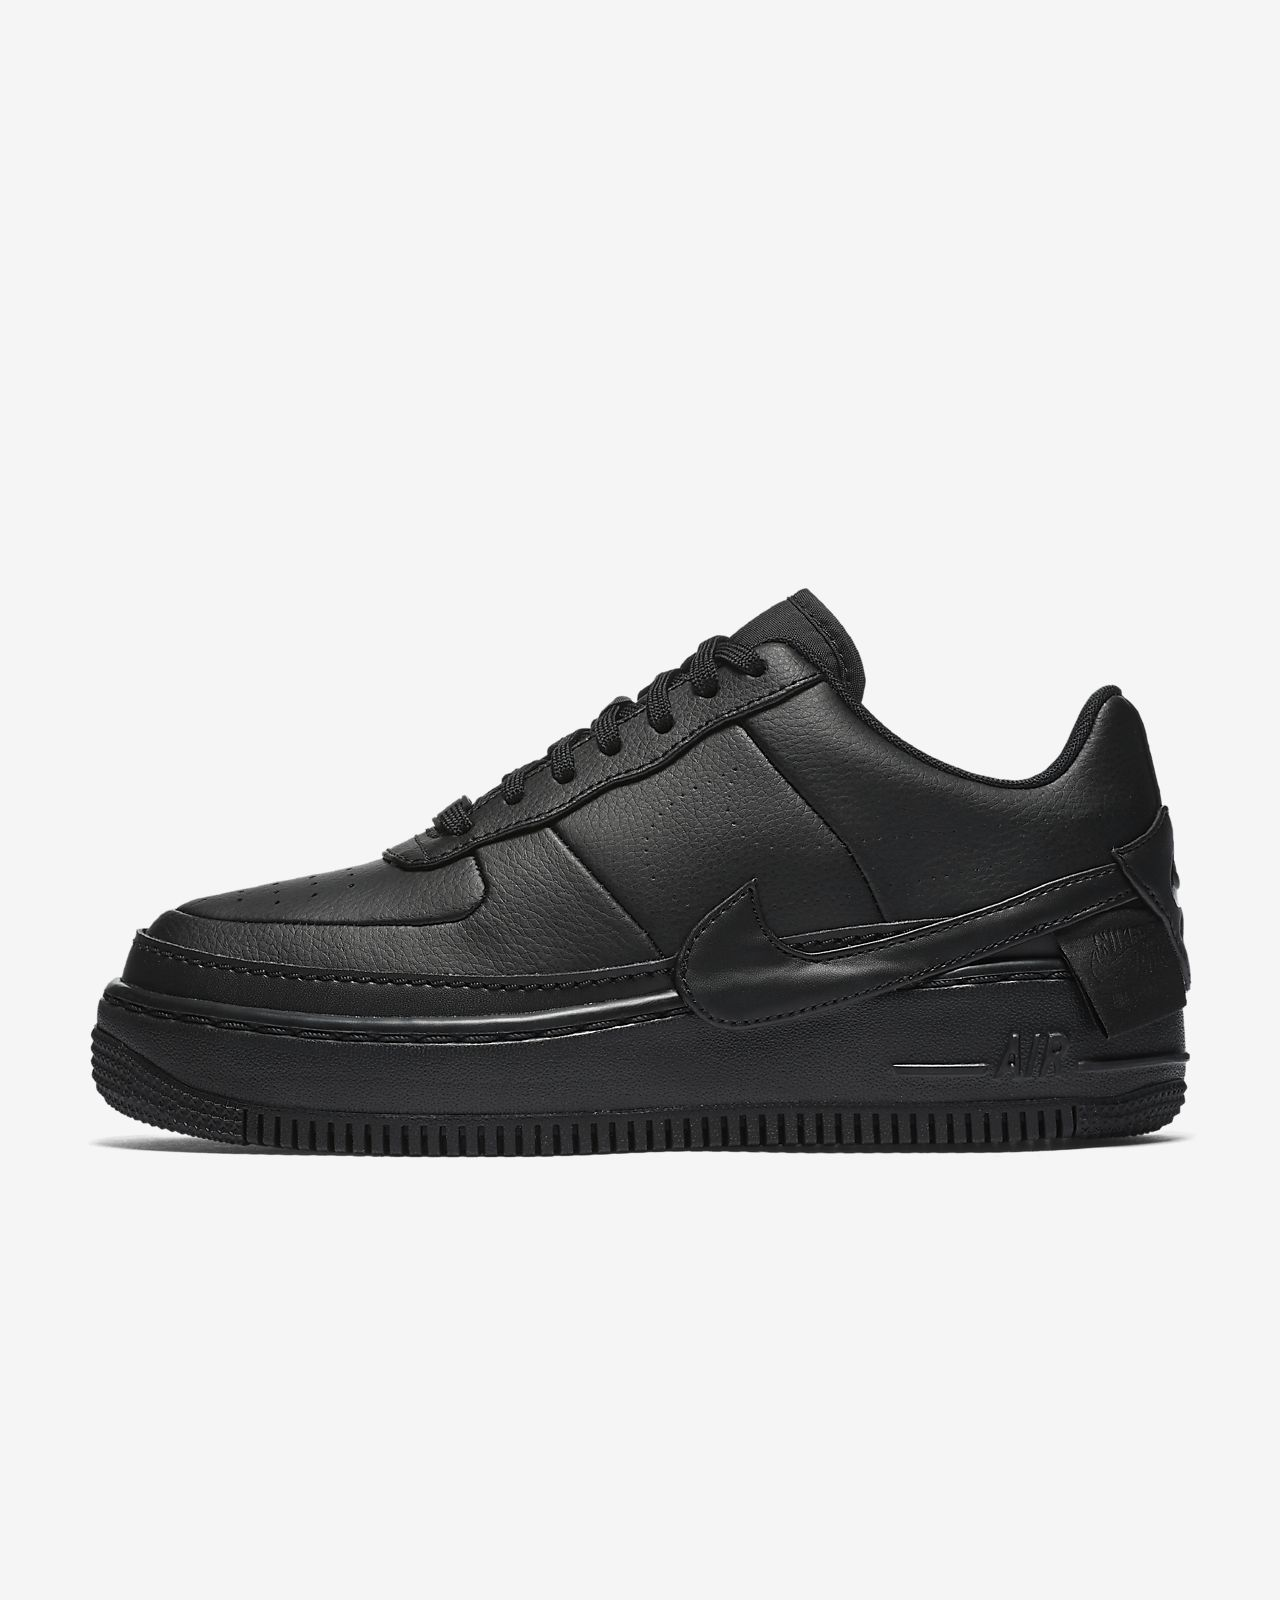 meet 4badc cee93 ... Nike Air Force 1 Jester XX-sko til kvinder